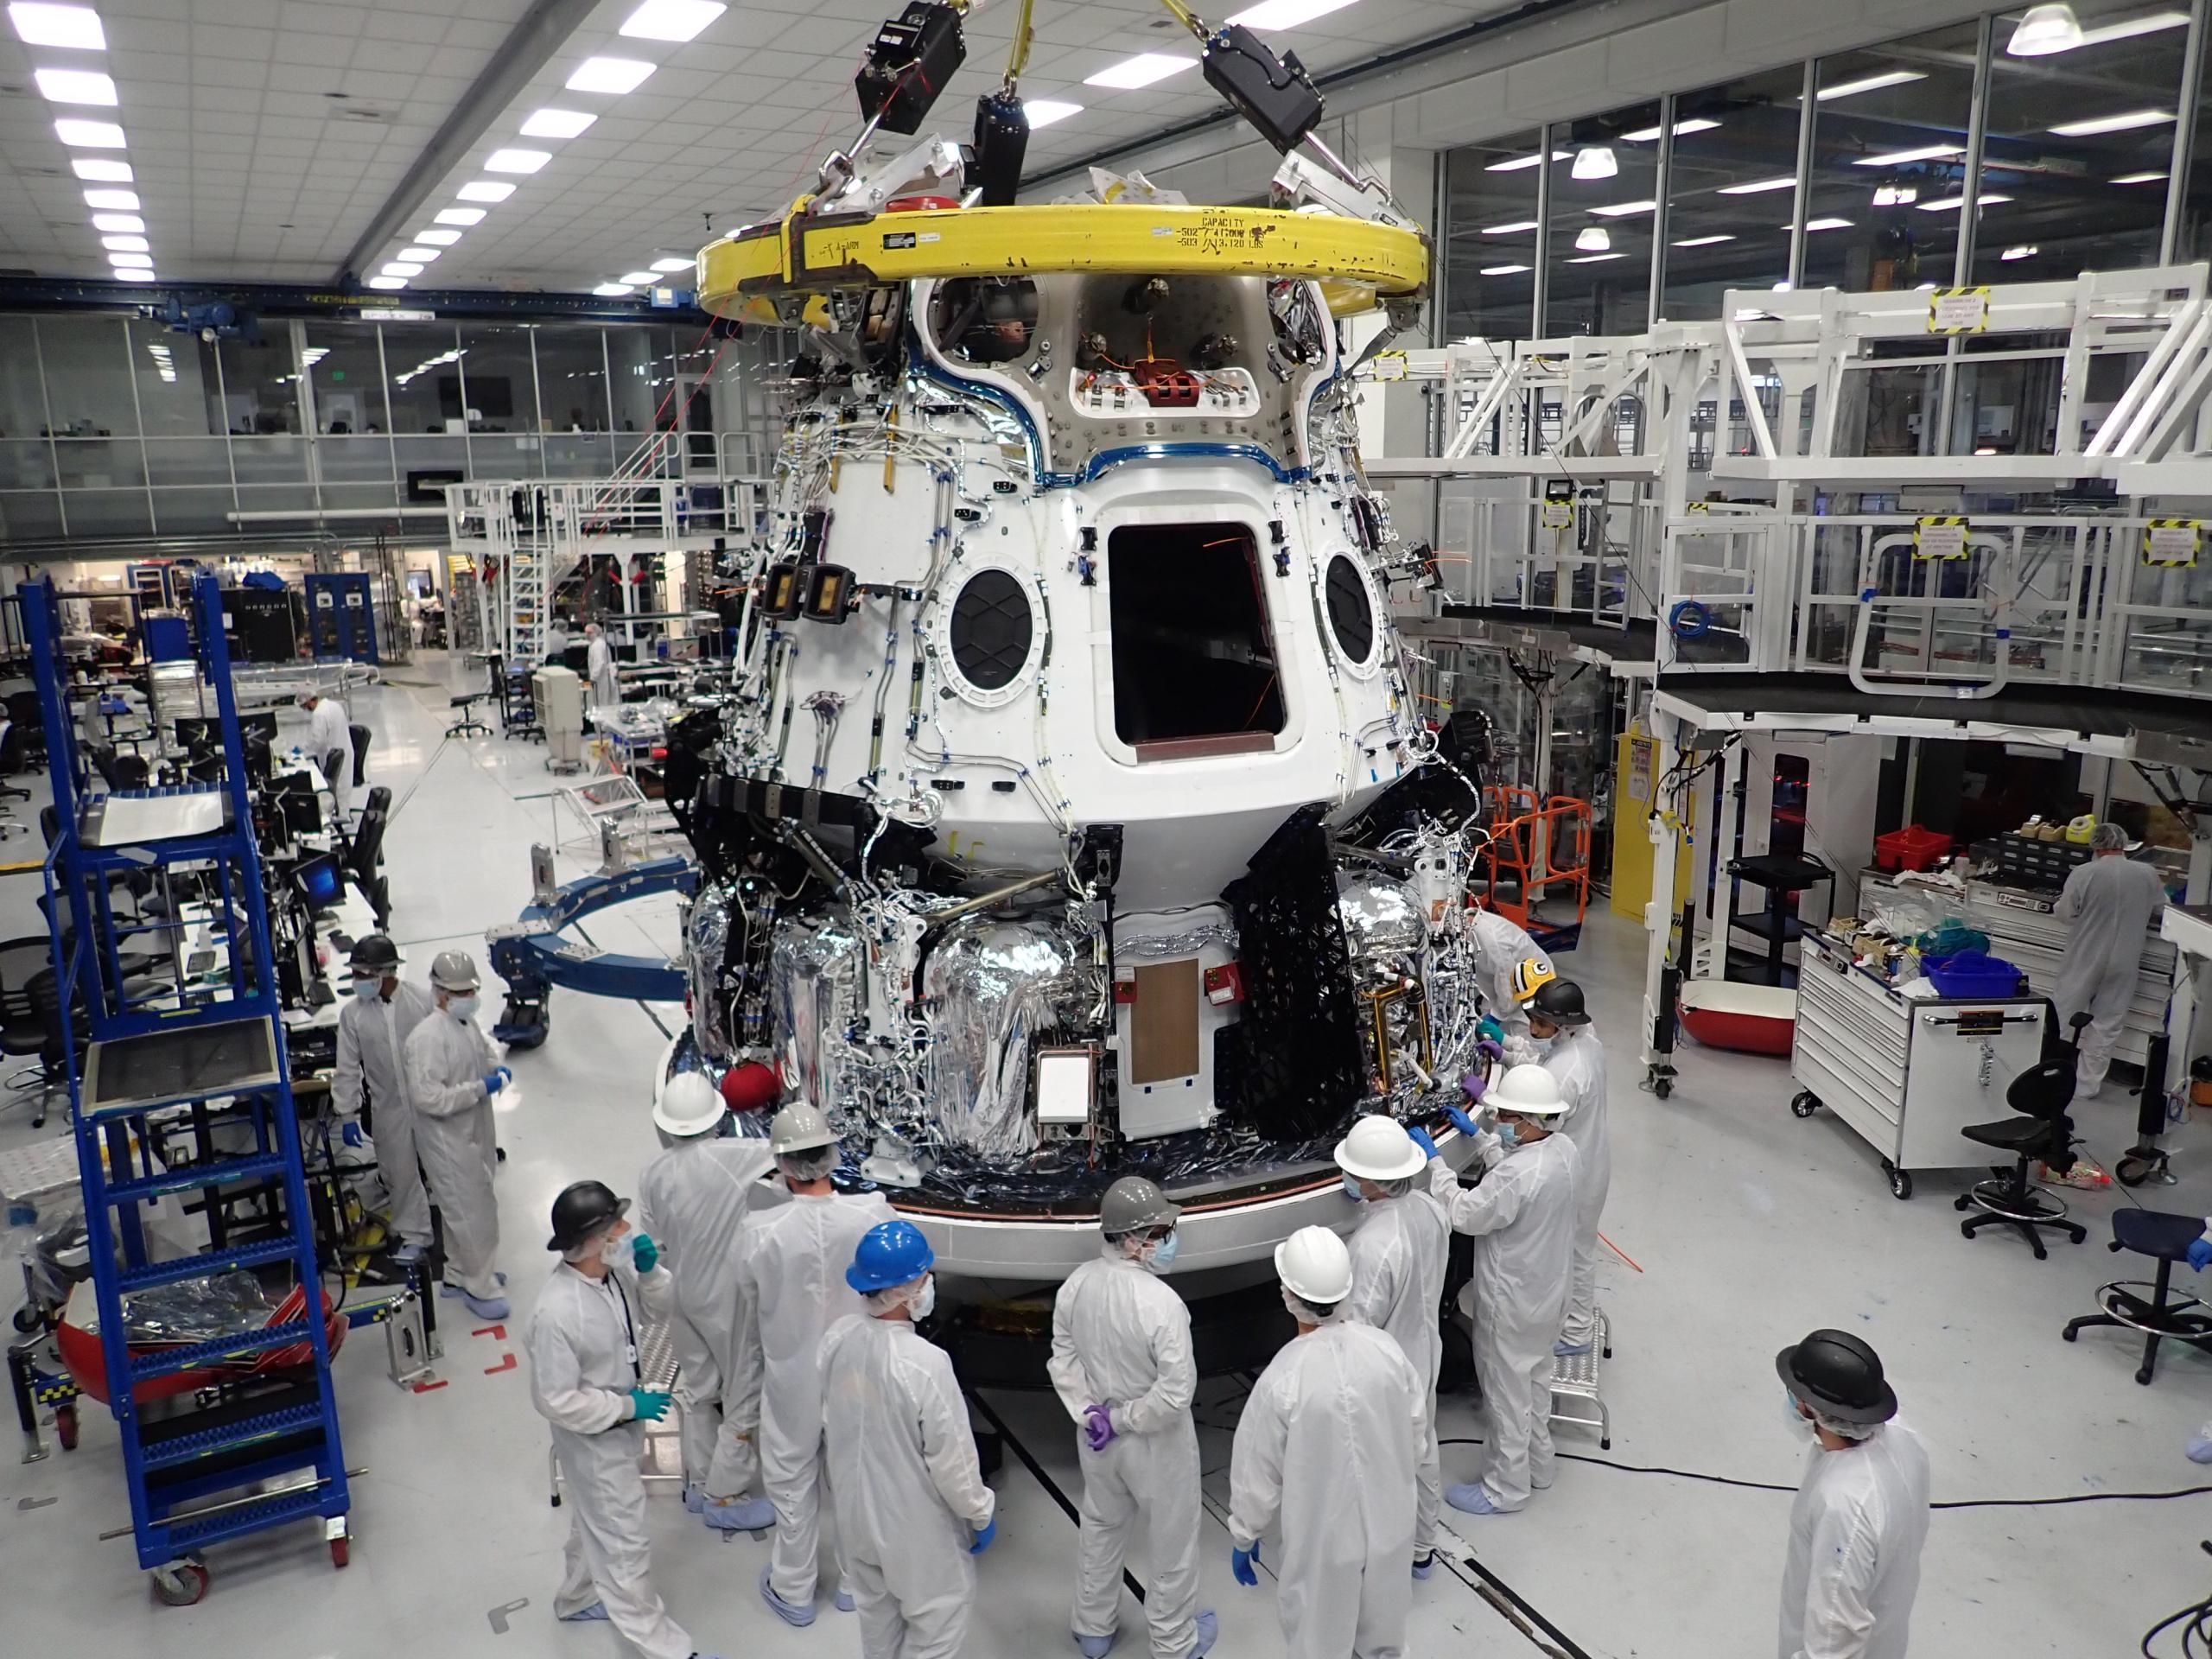 Cargo Dragon 2 SN1 Hawthorne (SpaceX) 1 (c)